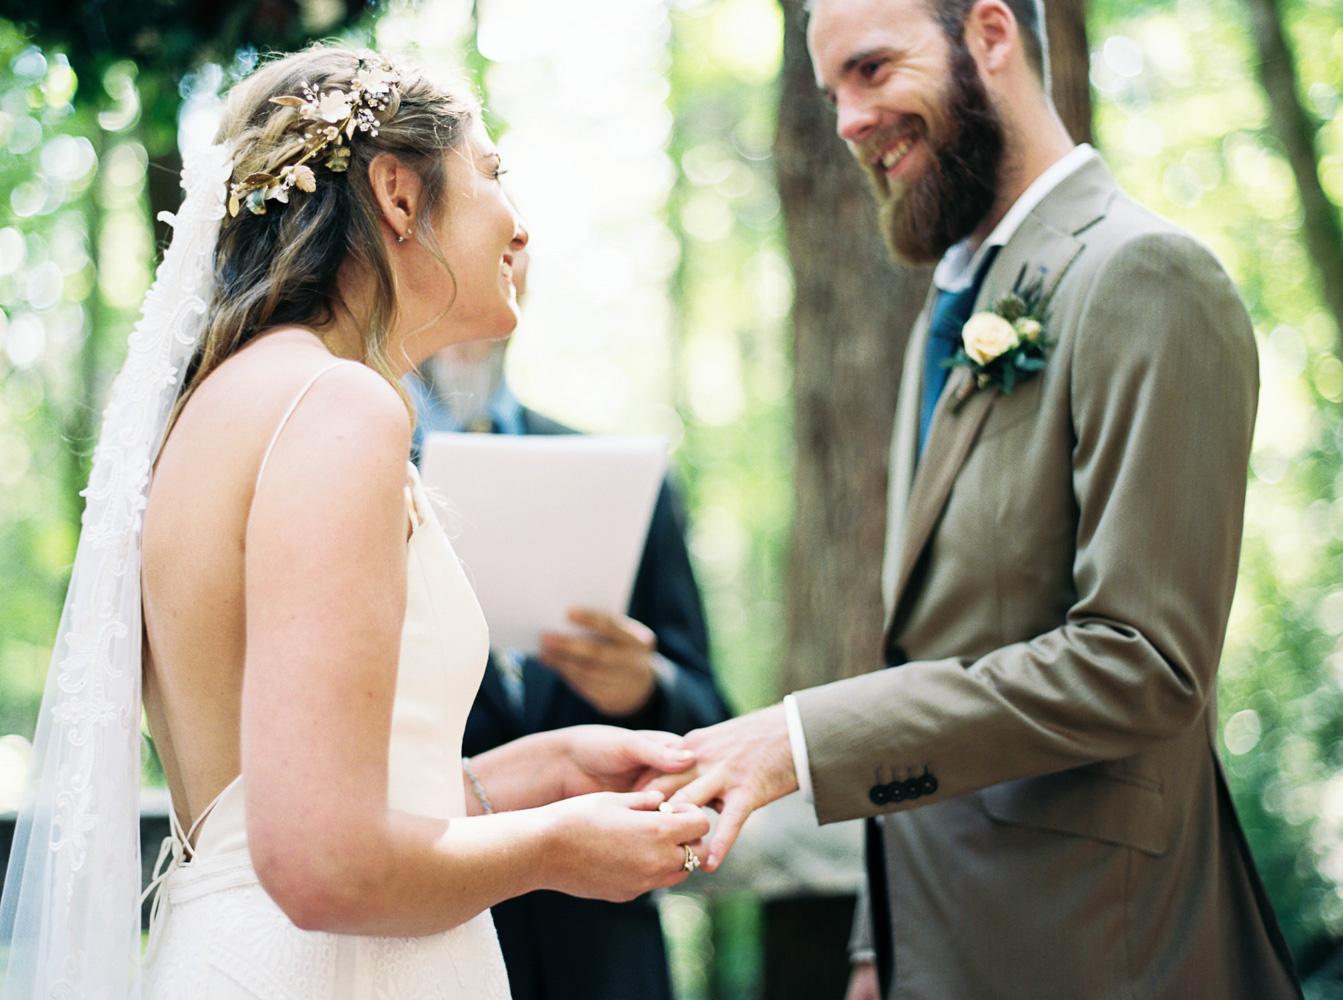 Wellspring Spa Wedding at Mt. Rainier | Seattle Wedding Photography